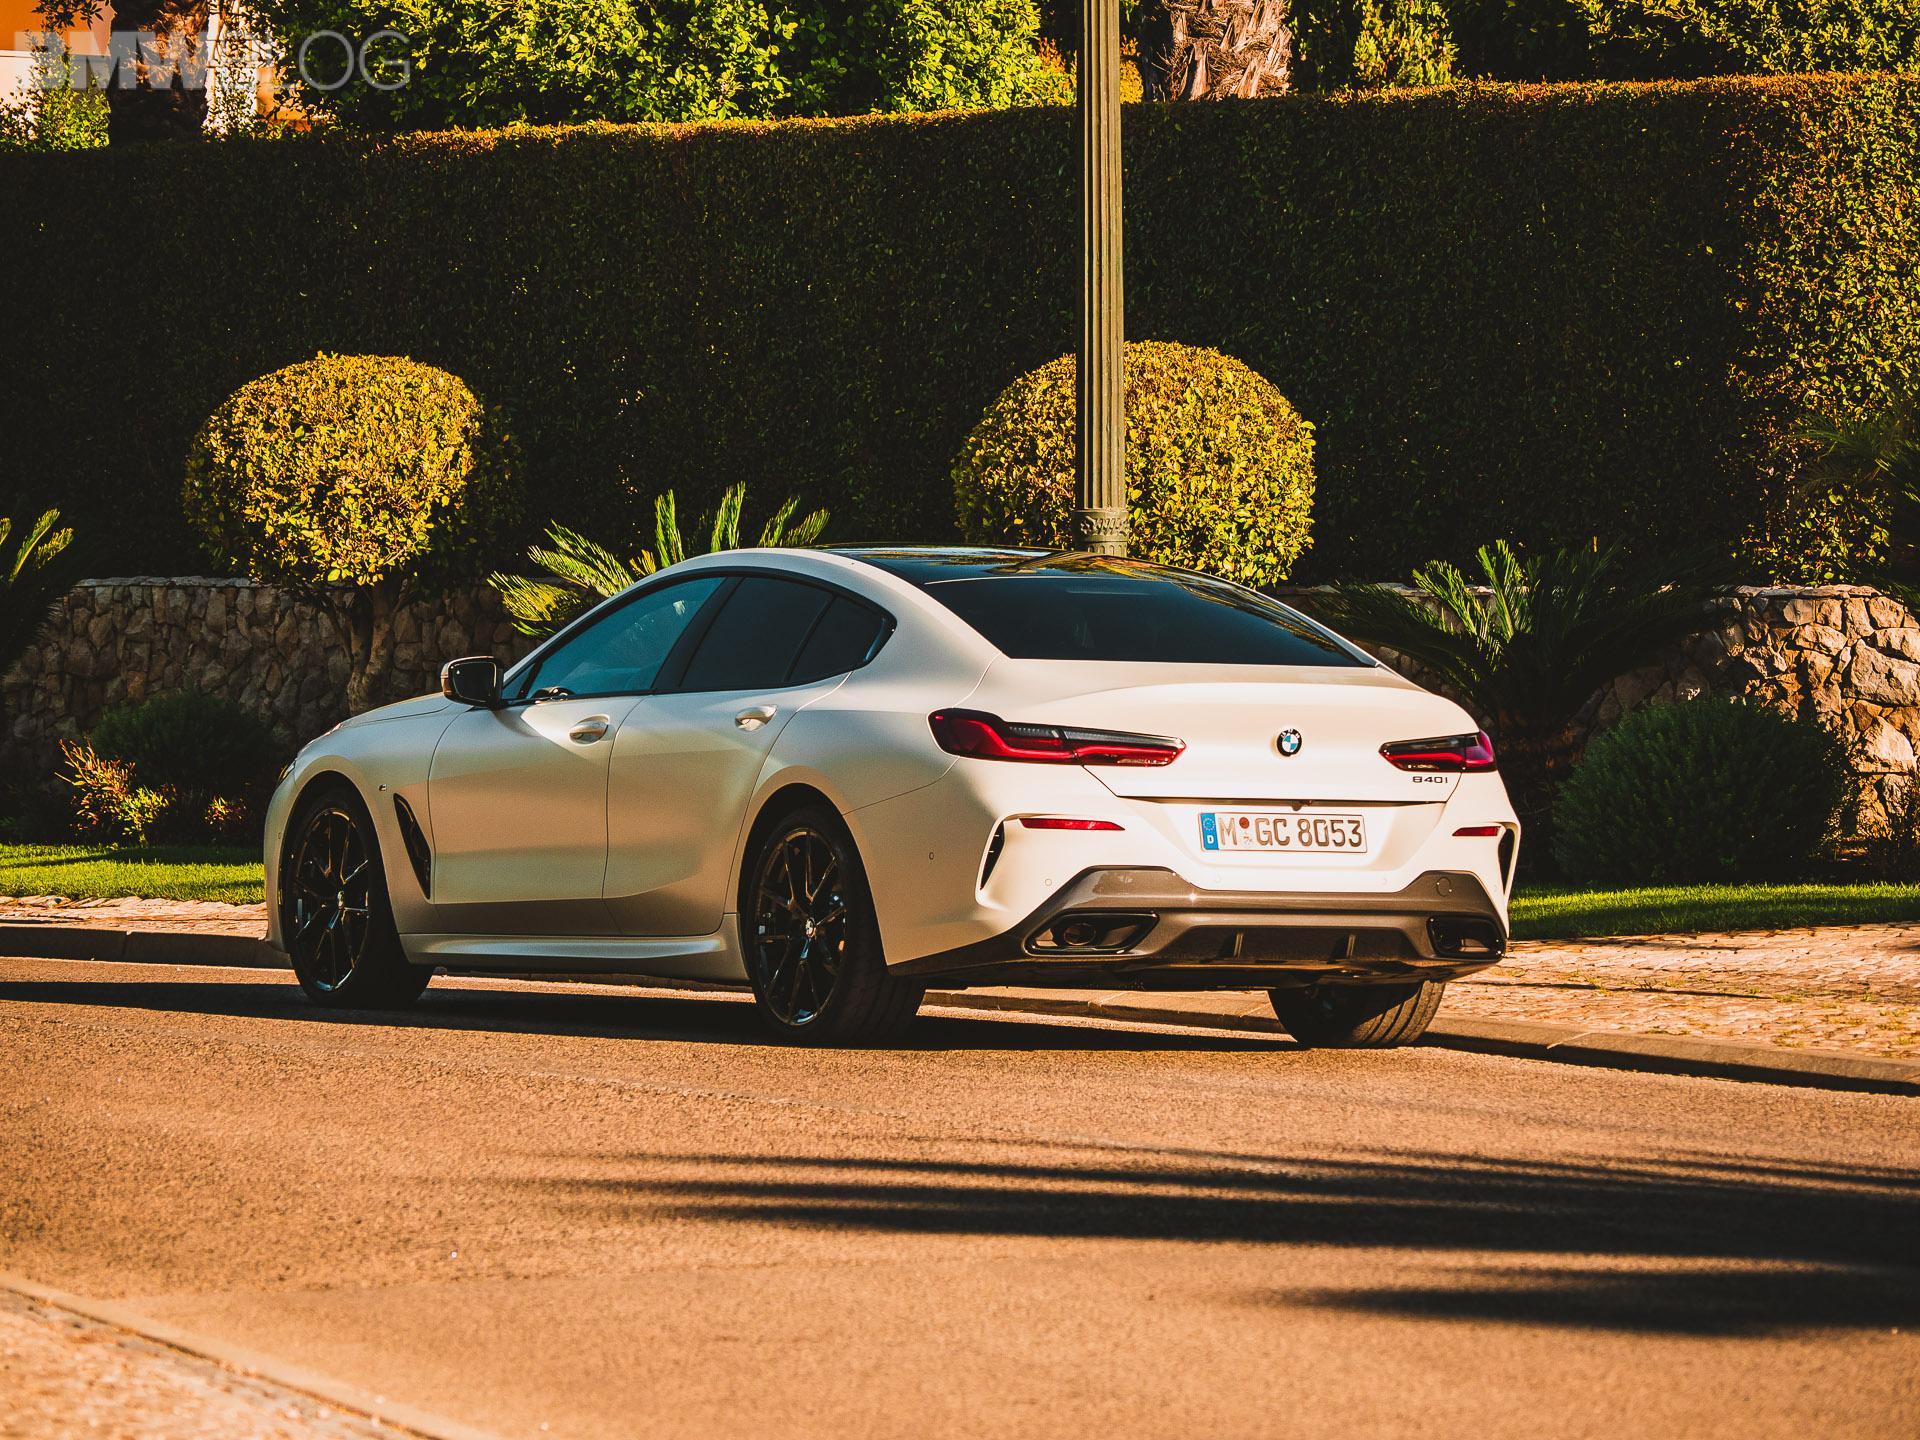 2020 BMW 8 SERIES GRAN COUPE PHOTOS 8